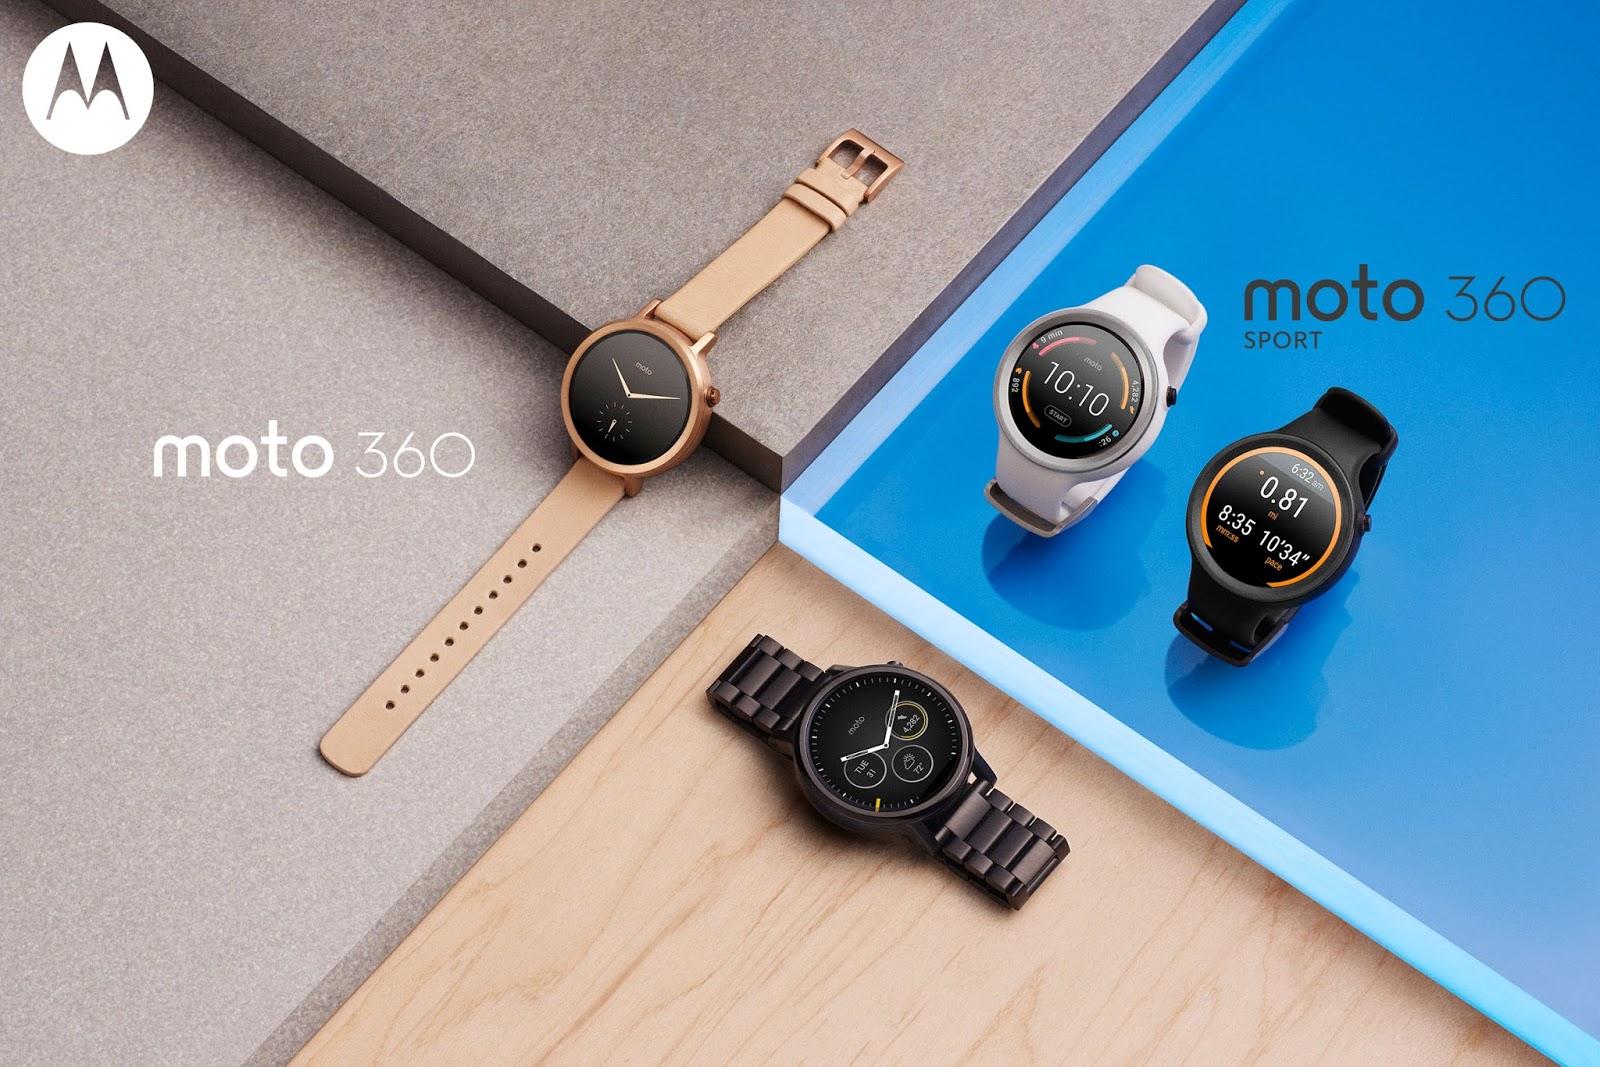 New Moto 360